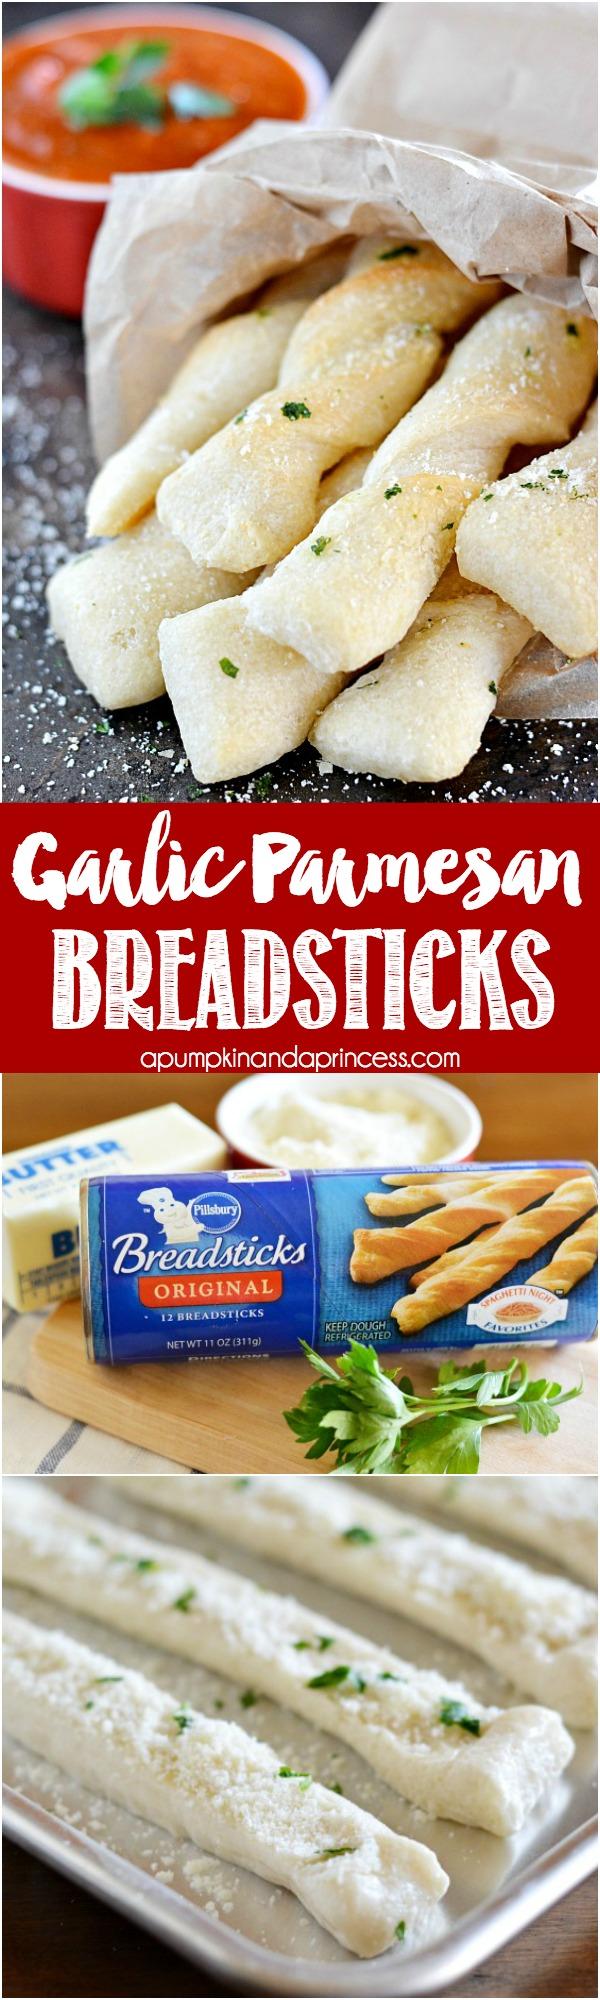 Garlic Parmesan Breadsticks - this garlic breadstick is SO easy to make!